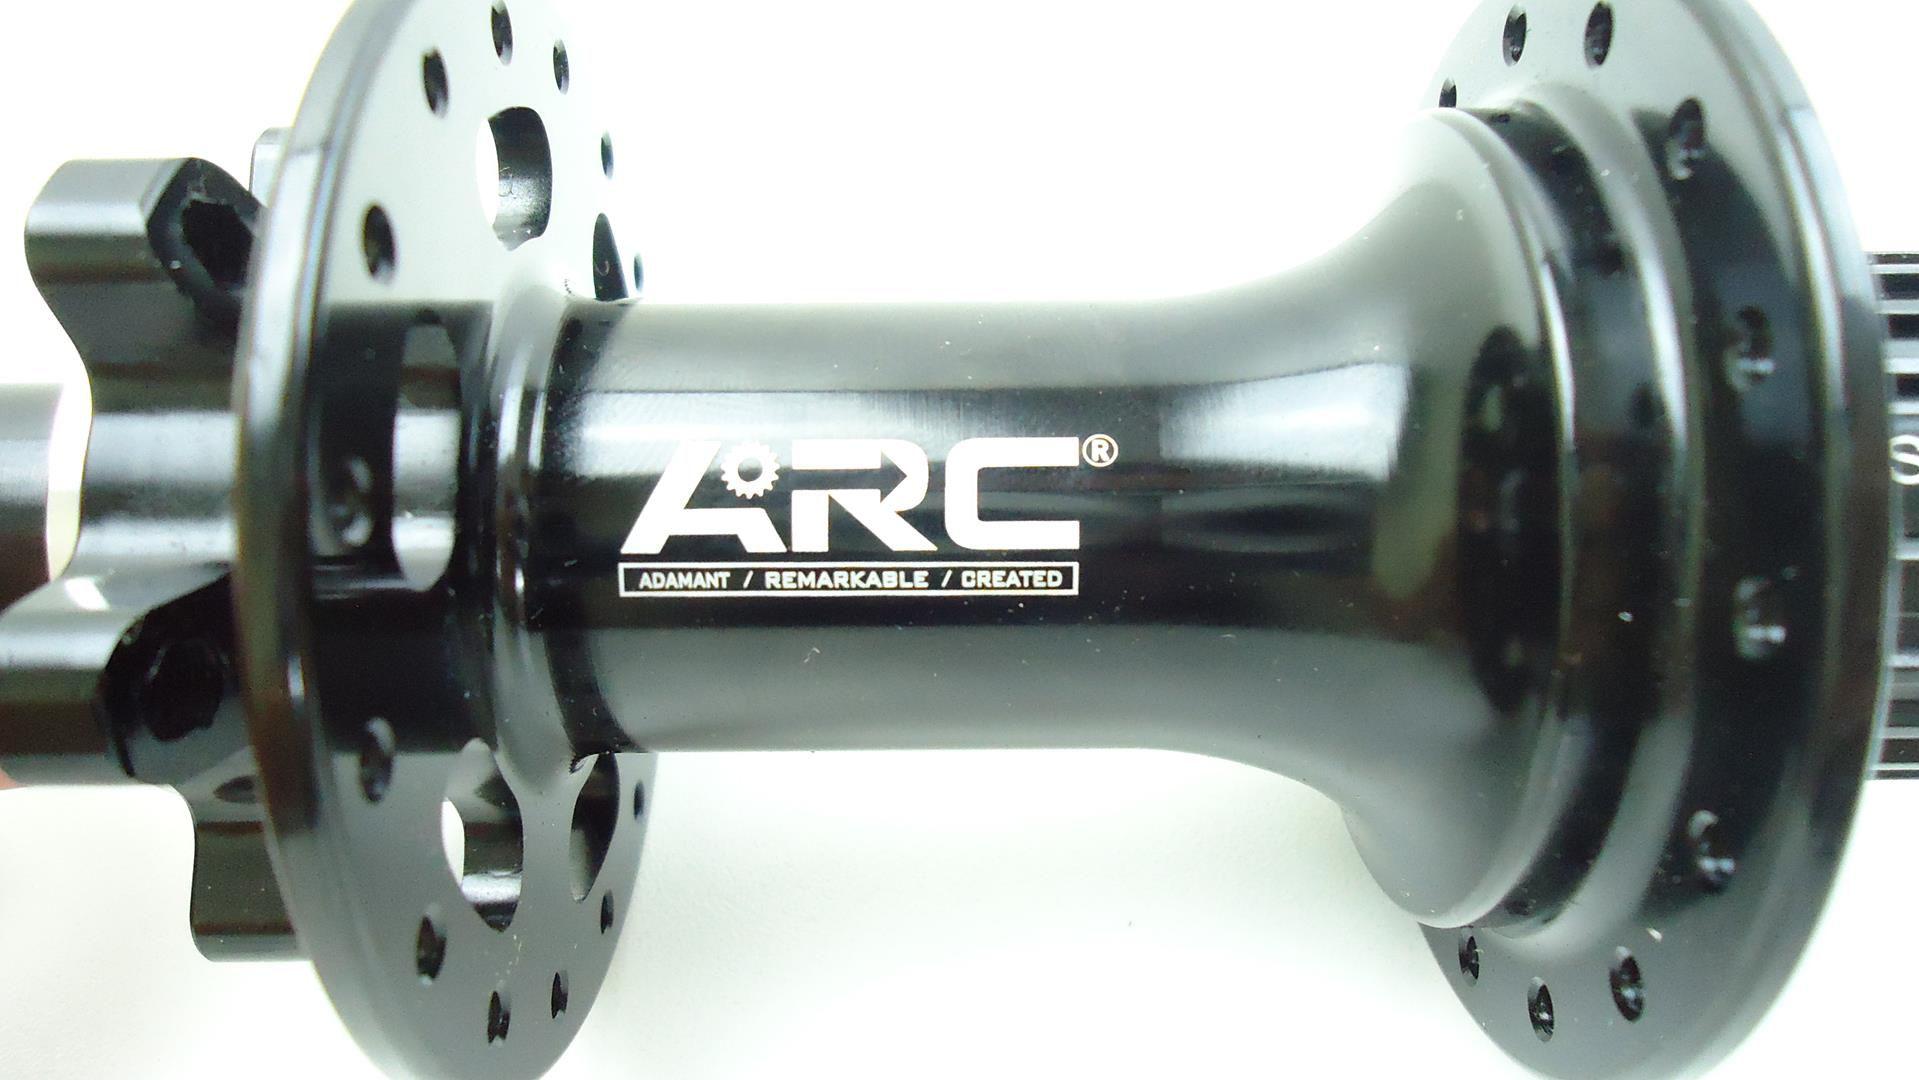 Cubo Traseiro ARC Shimano 12 velocidades Micro Spline 32 Furos Eixo 148mm Boost p/ SLX M7100 XT M8100 XTR M9100